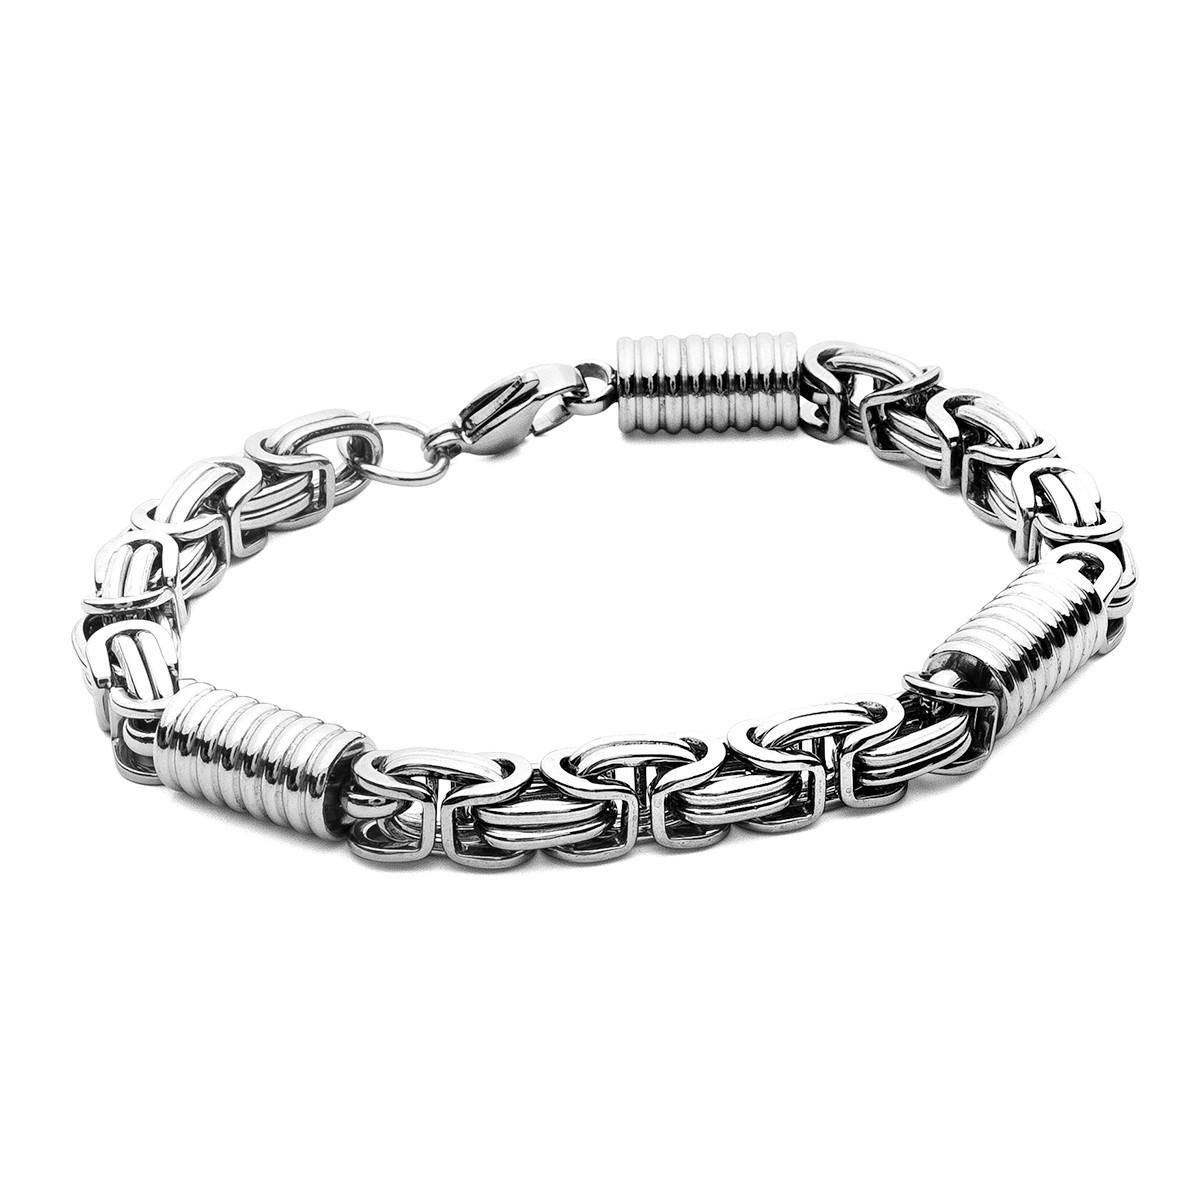 Bizantine armband, stahl - modell 010